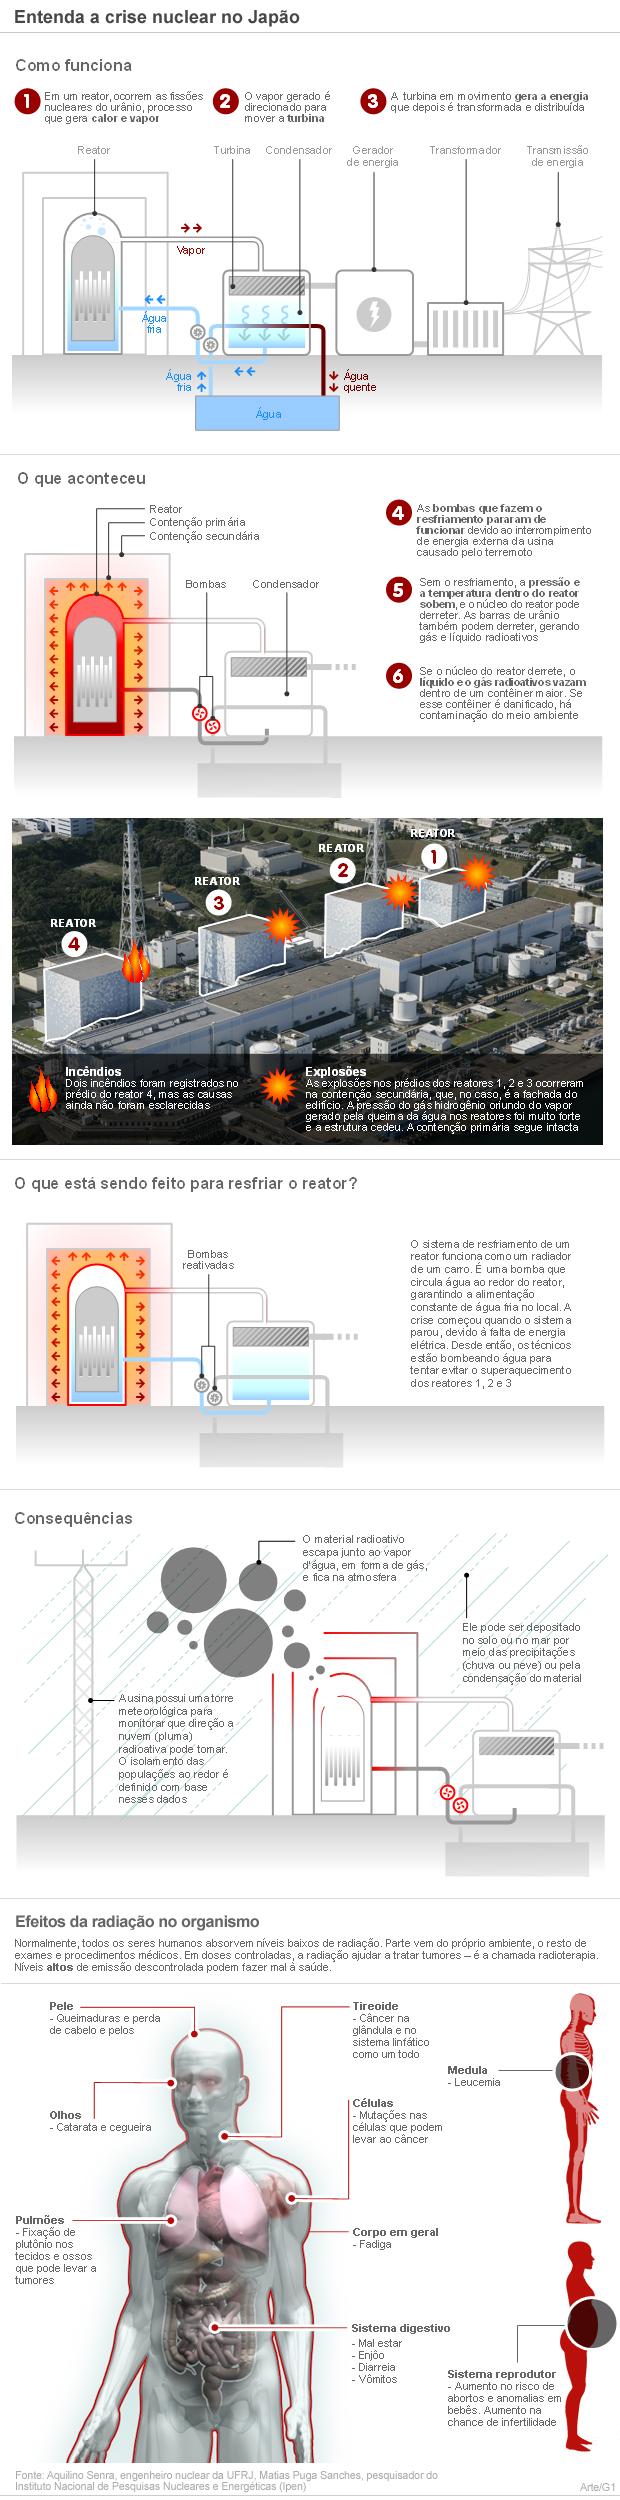 infografico entenda crise nuclear japao (Foto: Arte G1)